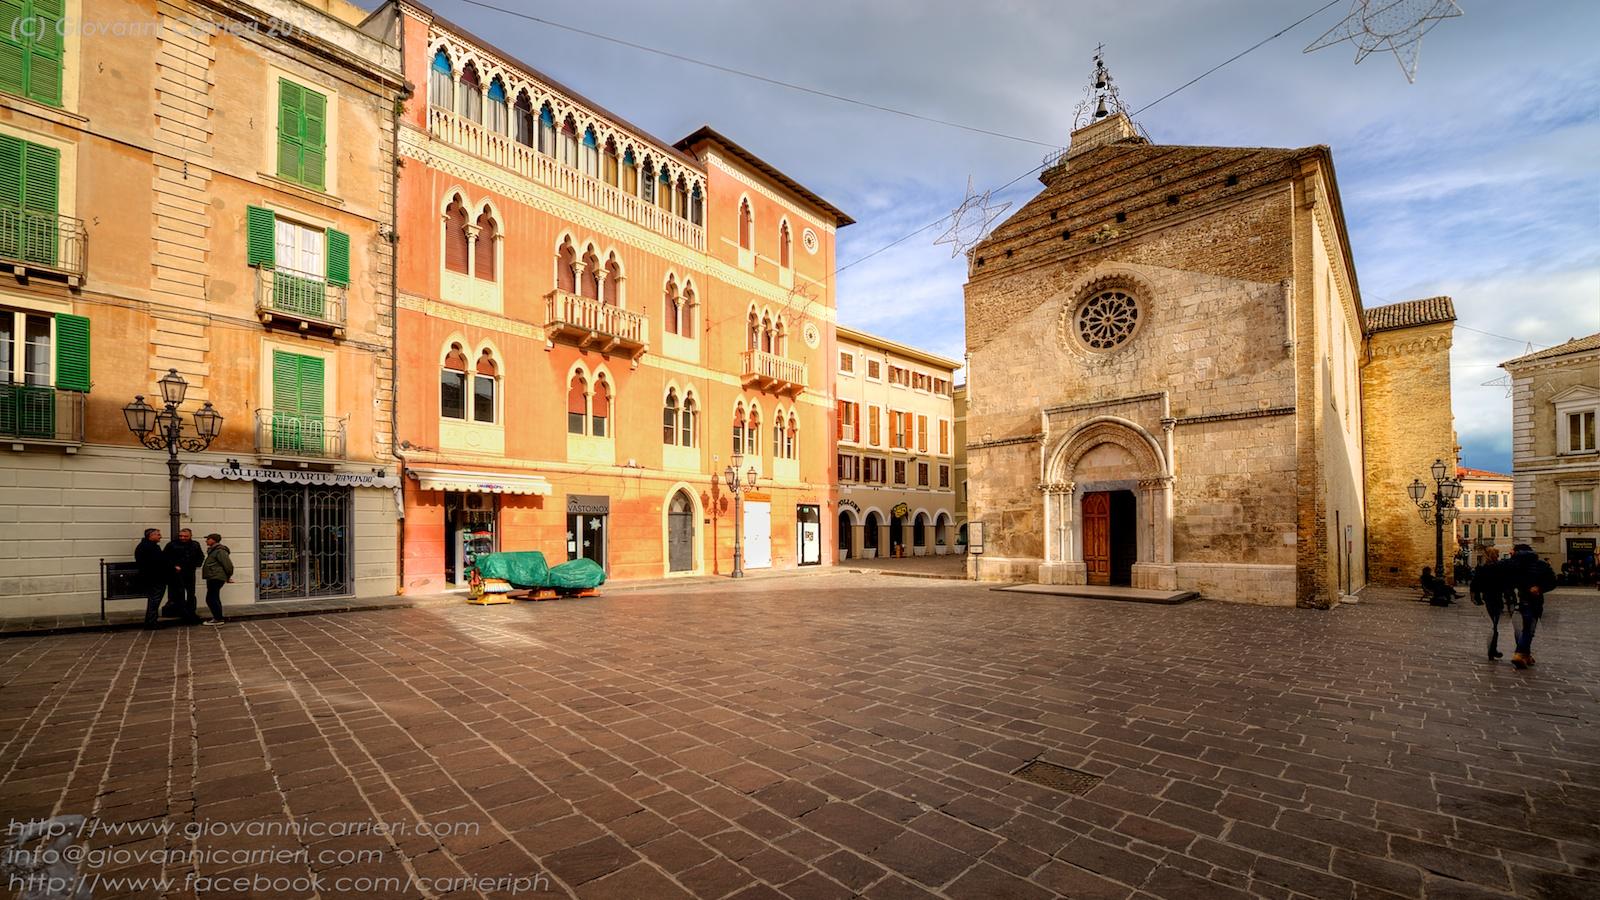 Il duomo di Vasto - San Giuseppe